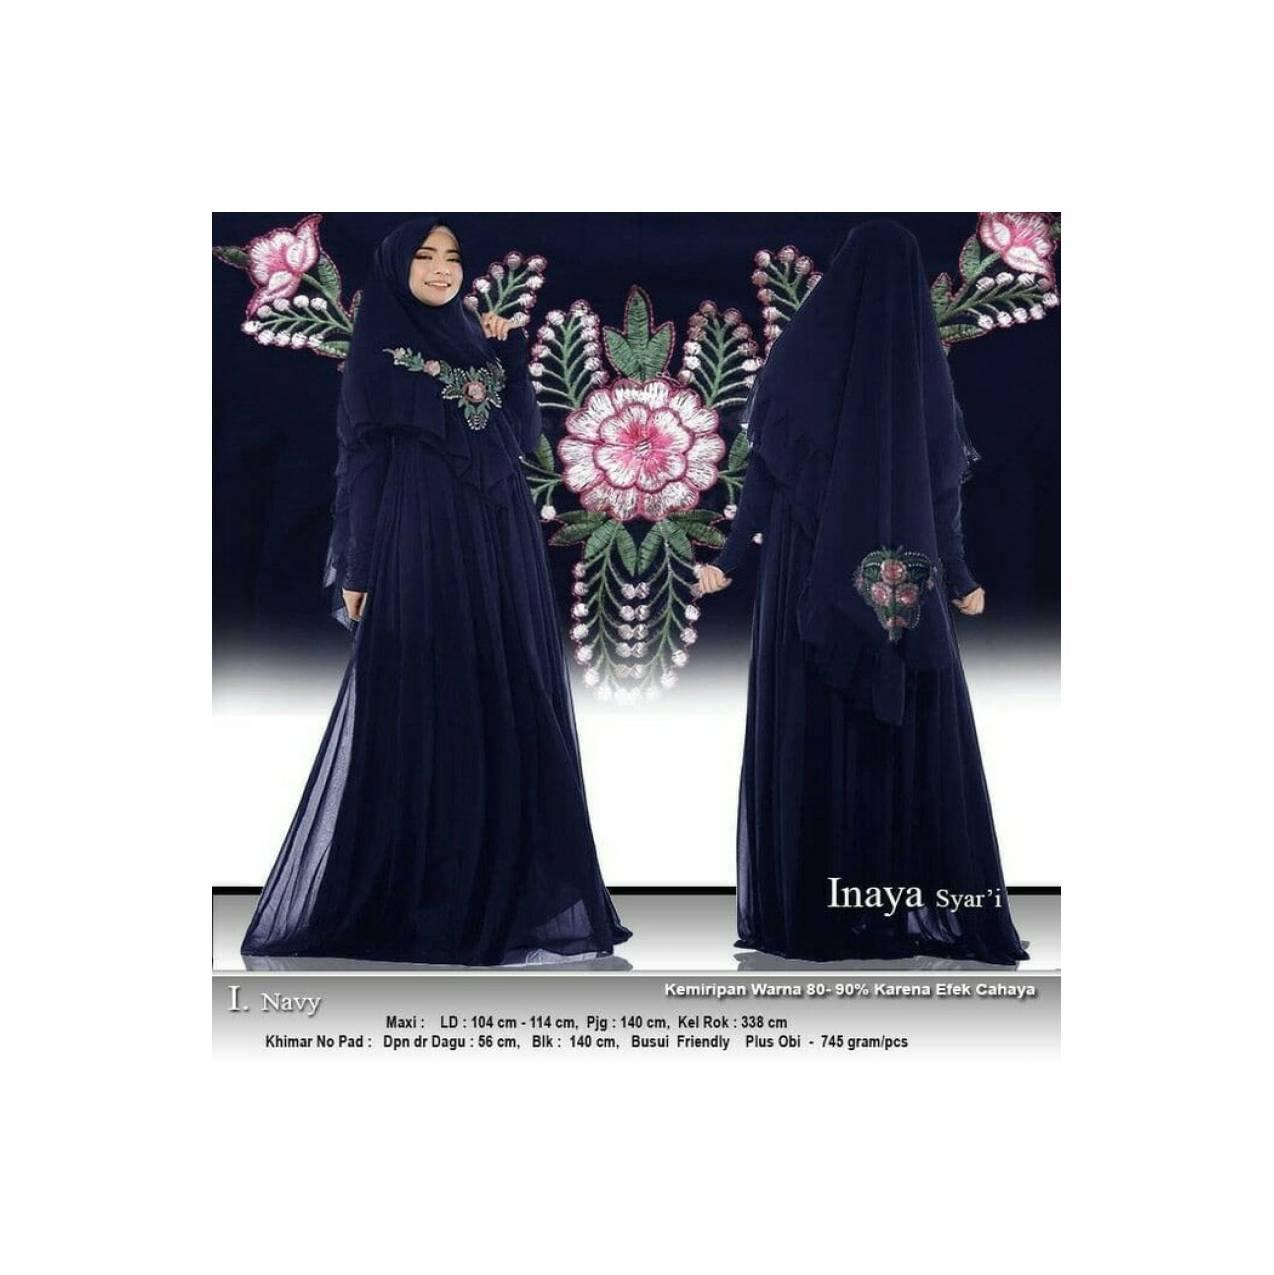 Baju Busana Muslim Gamis Maxy Wanita/Pakaian Maxy Bordir Inaya Navy